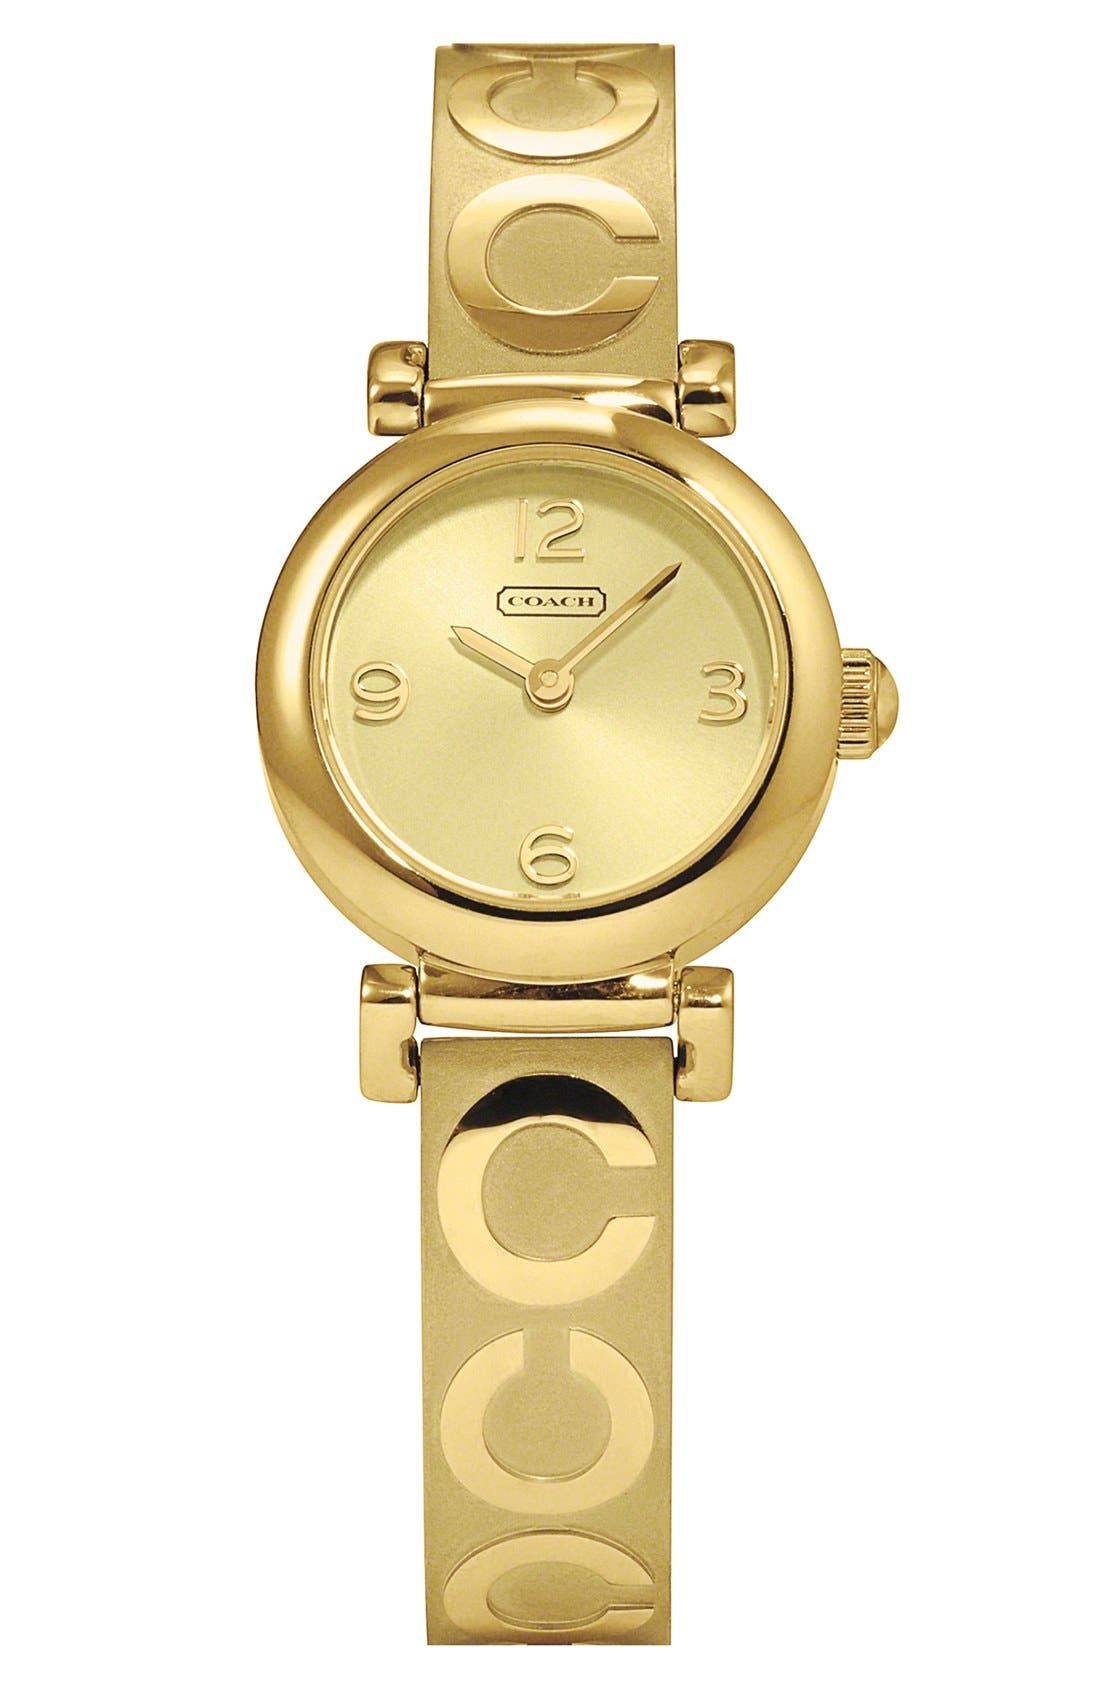 Main Image - COACH 'Madison' Etched Bangle Watch, 23mm